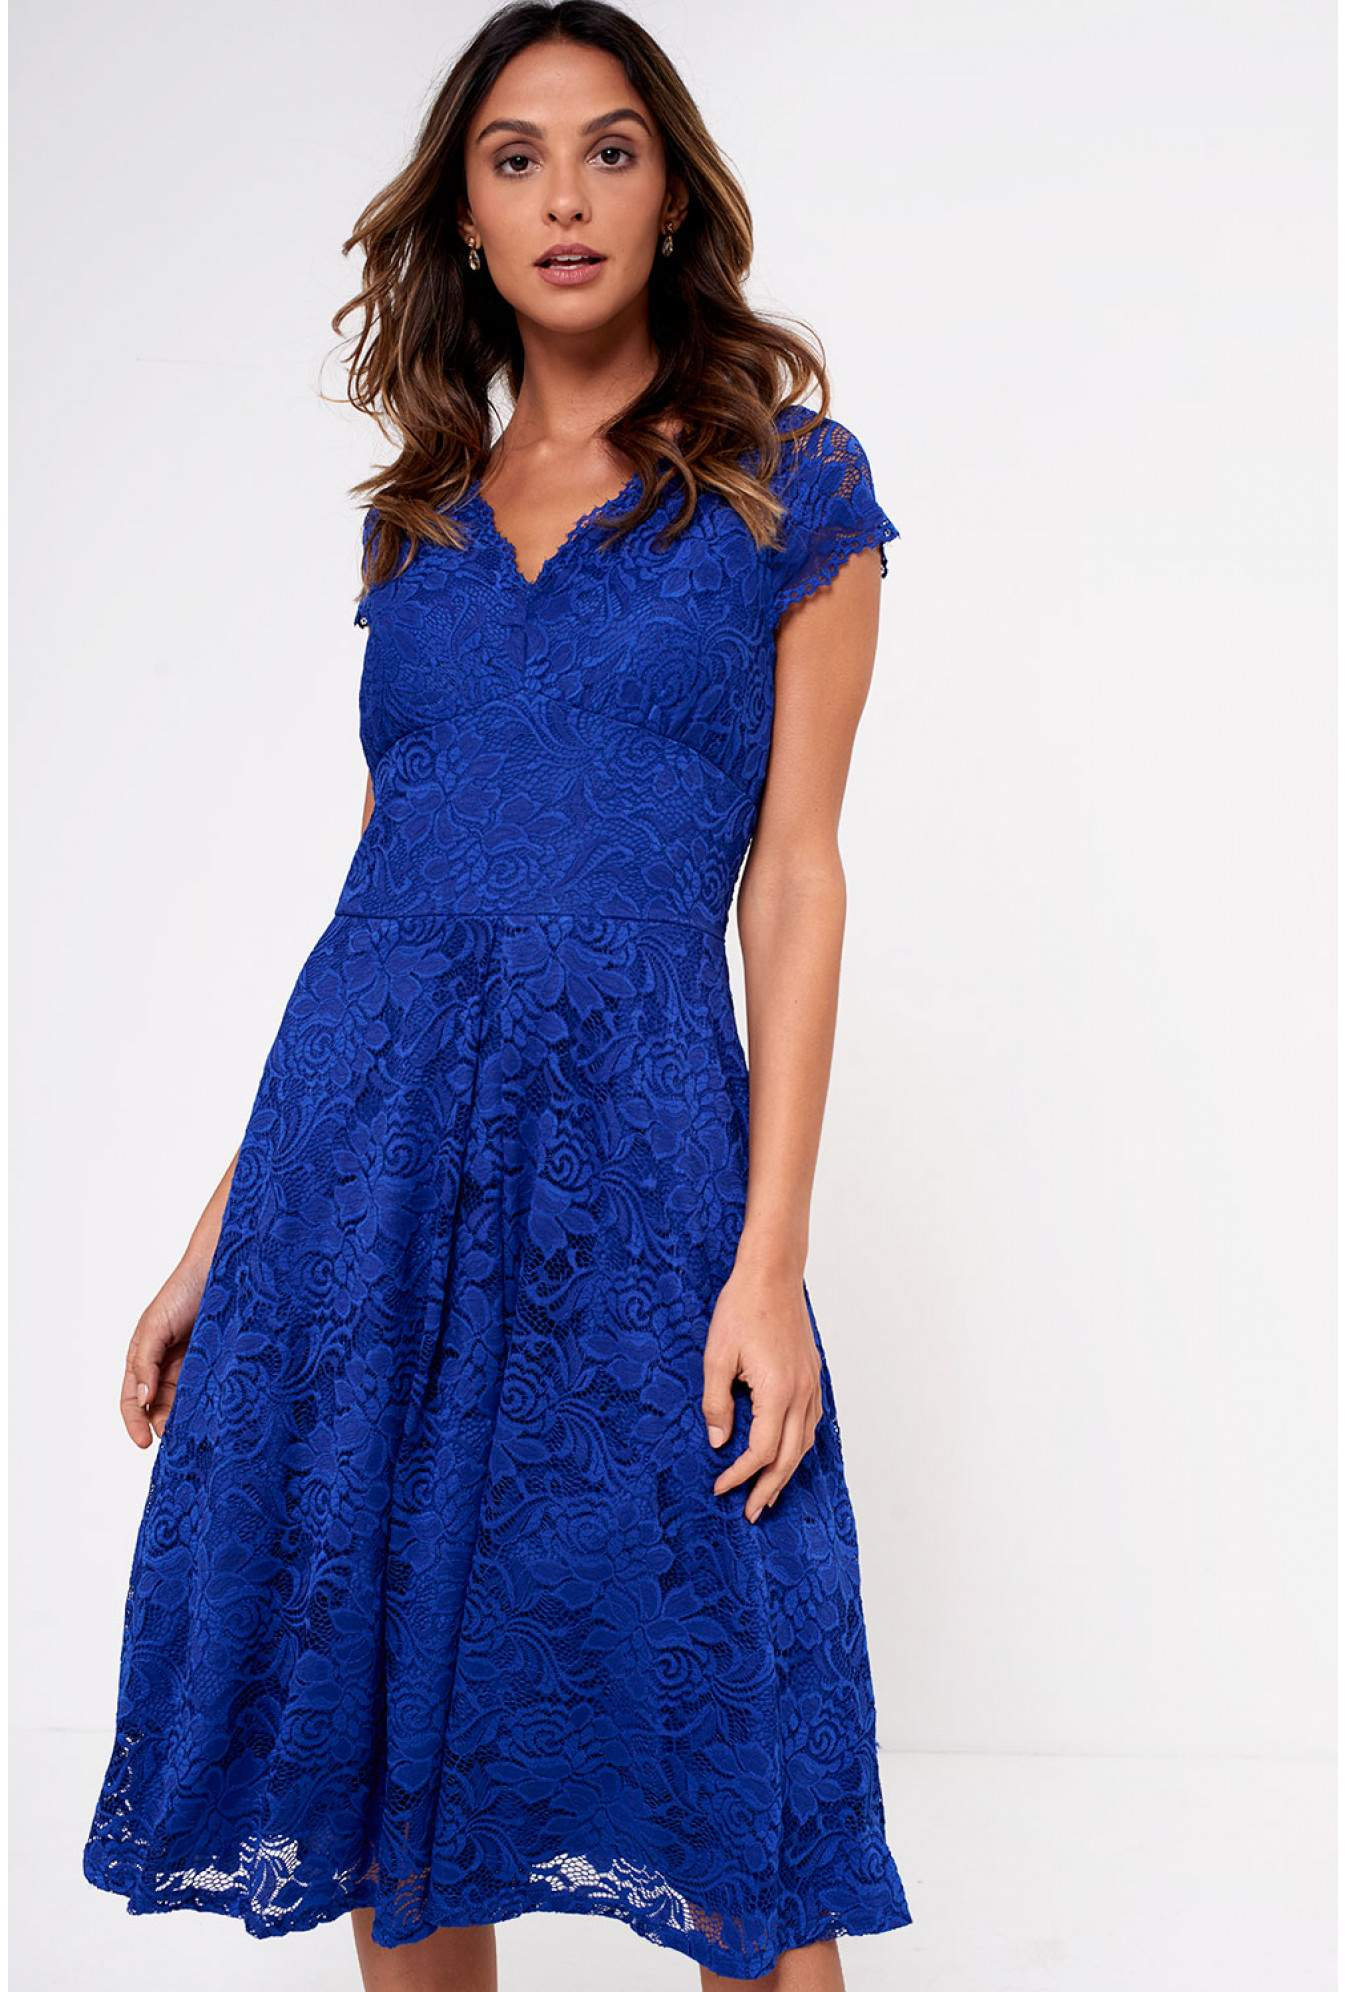 948f3fa59bf2 Marc Angelo Samia Lace Midi Skater Dress in Royal Blue